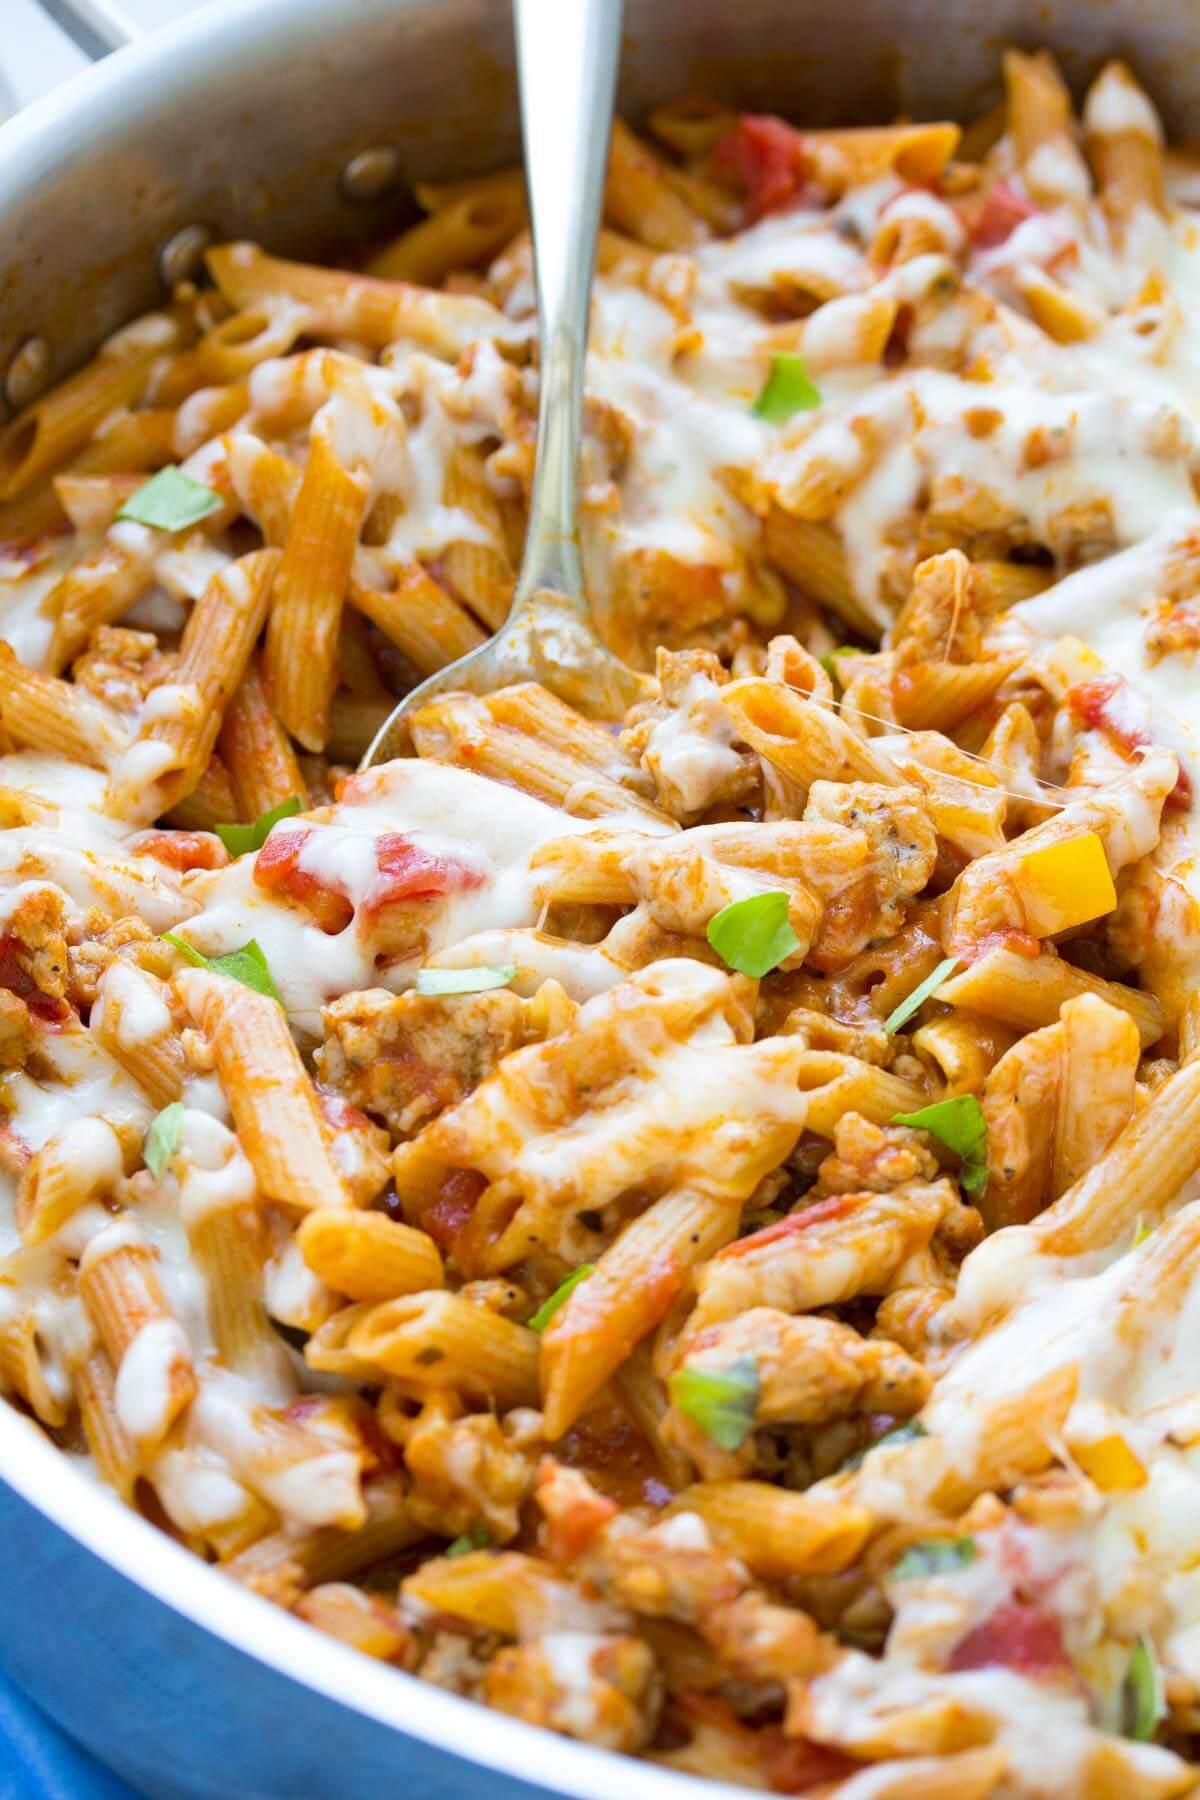 5 Ingredient One Pot Pasta with Chicken Sausage. Ready in 30 minutes!   www.kristineskitchenblog.com